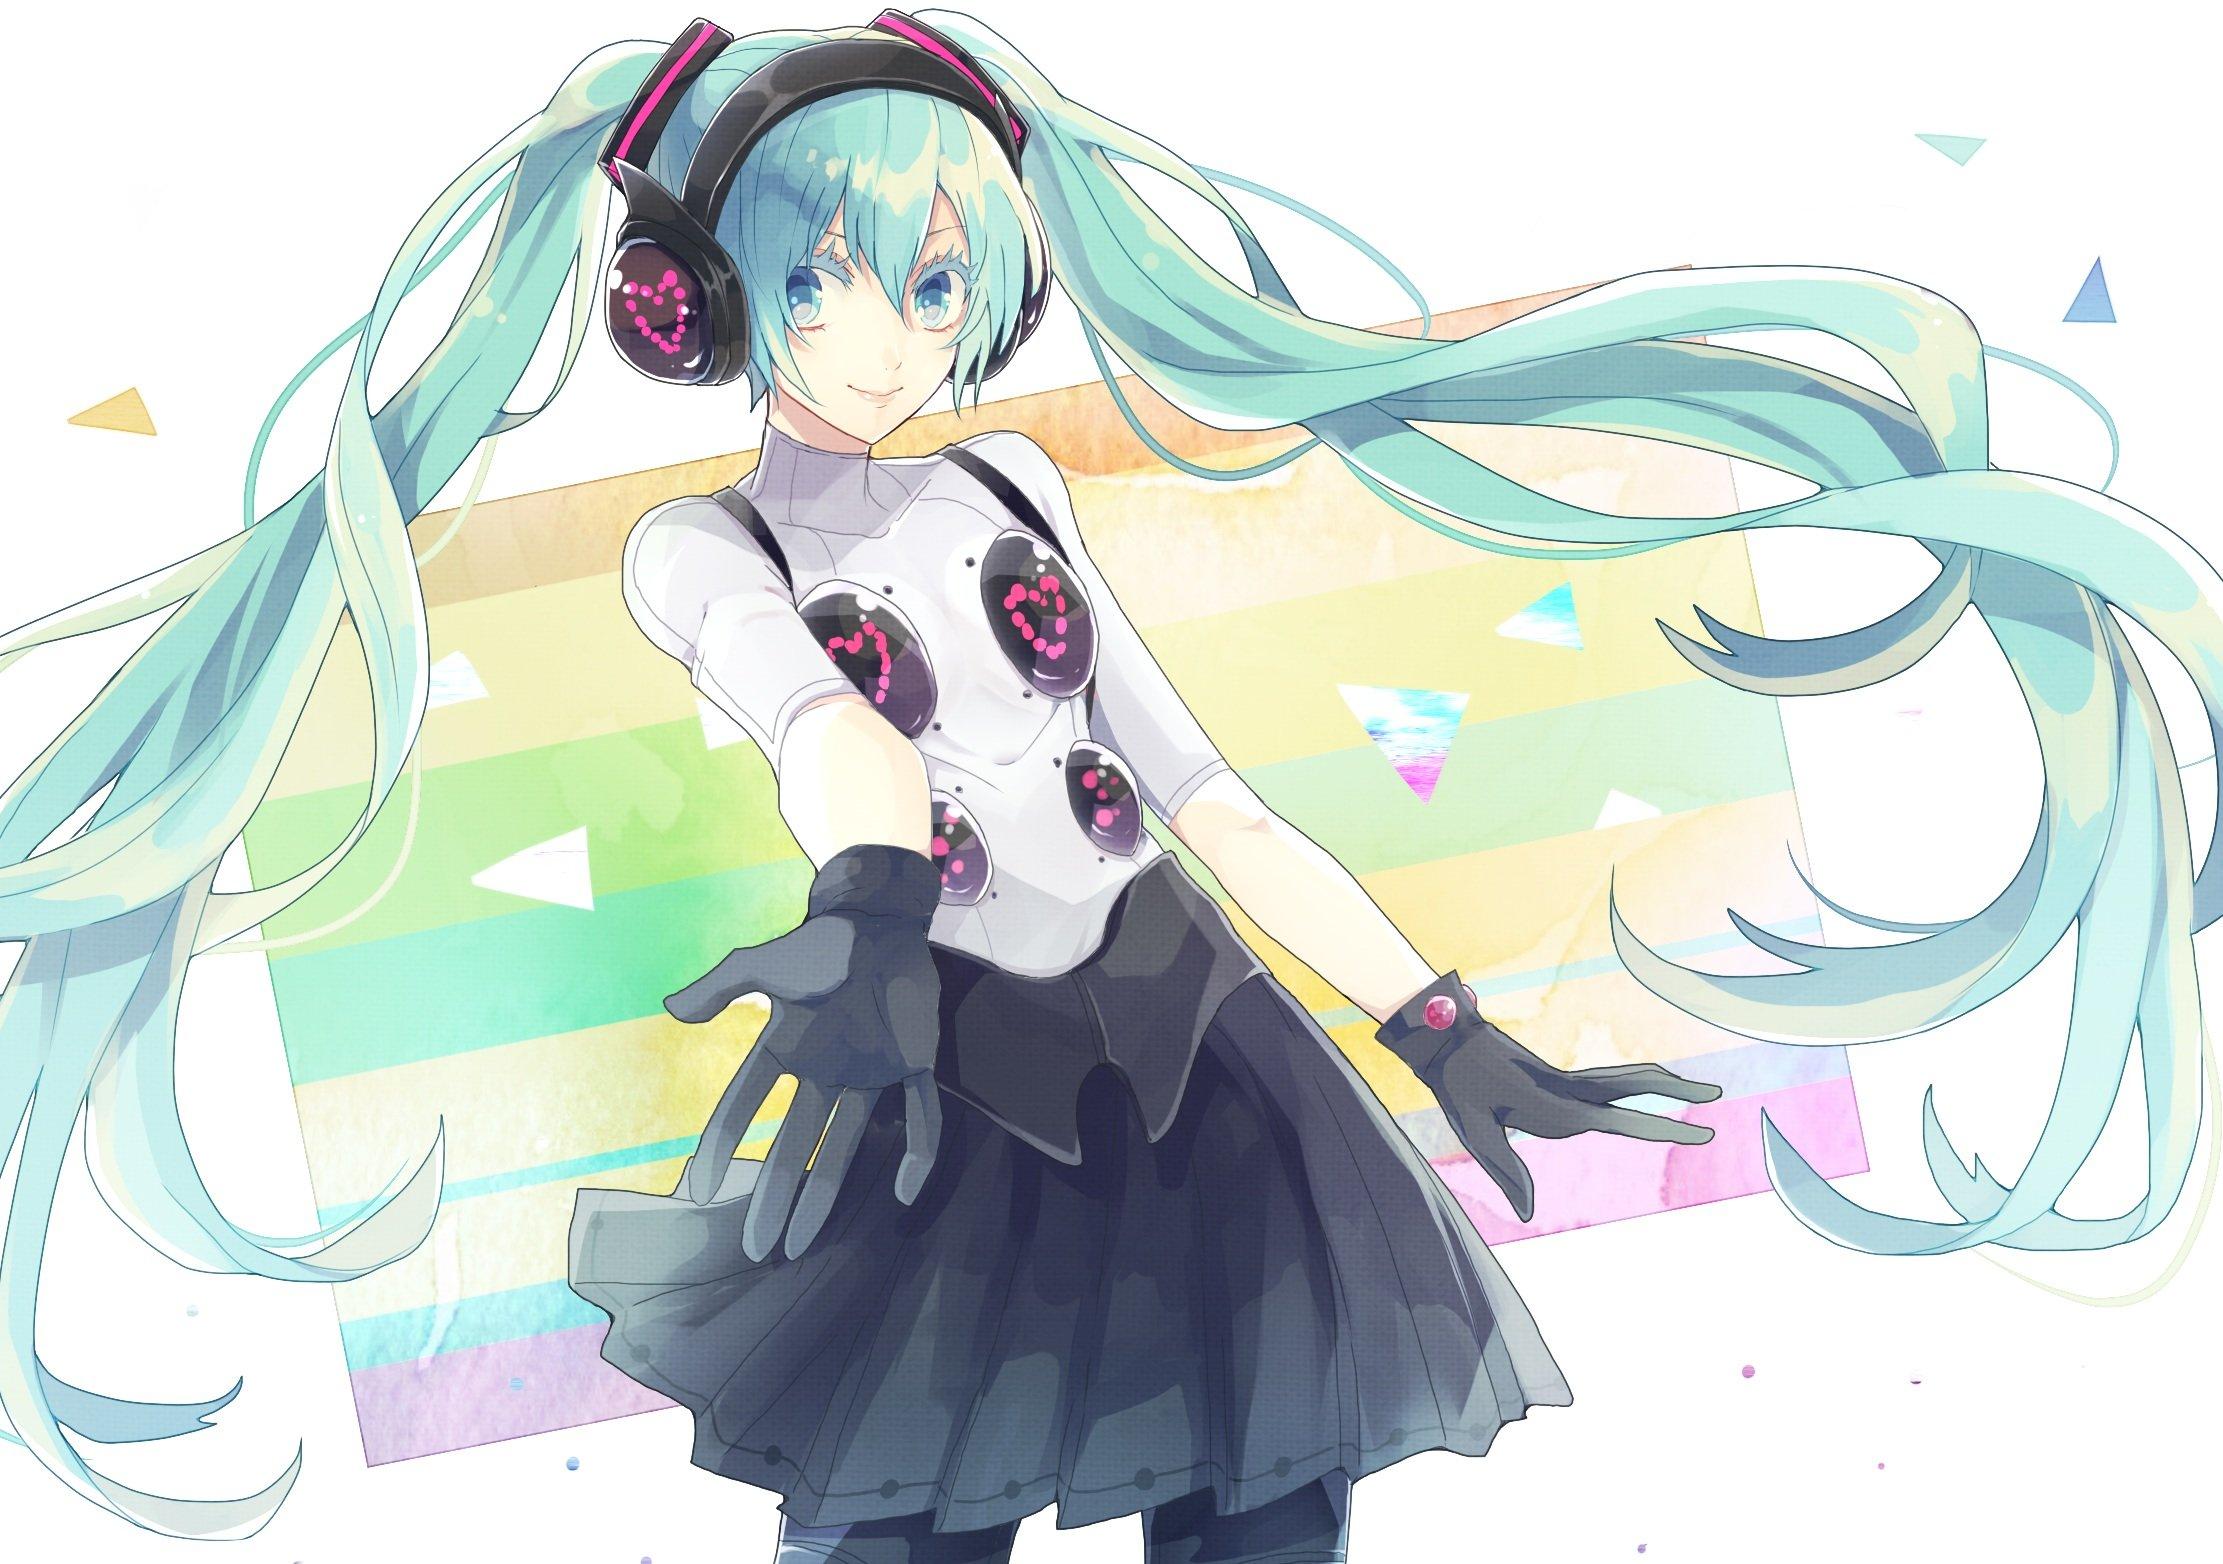 Hatsune Miku Junjam Persona Persona 4 Dancing All Night Vocaloid